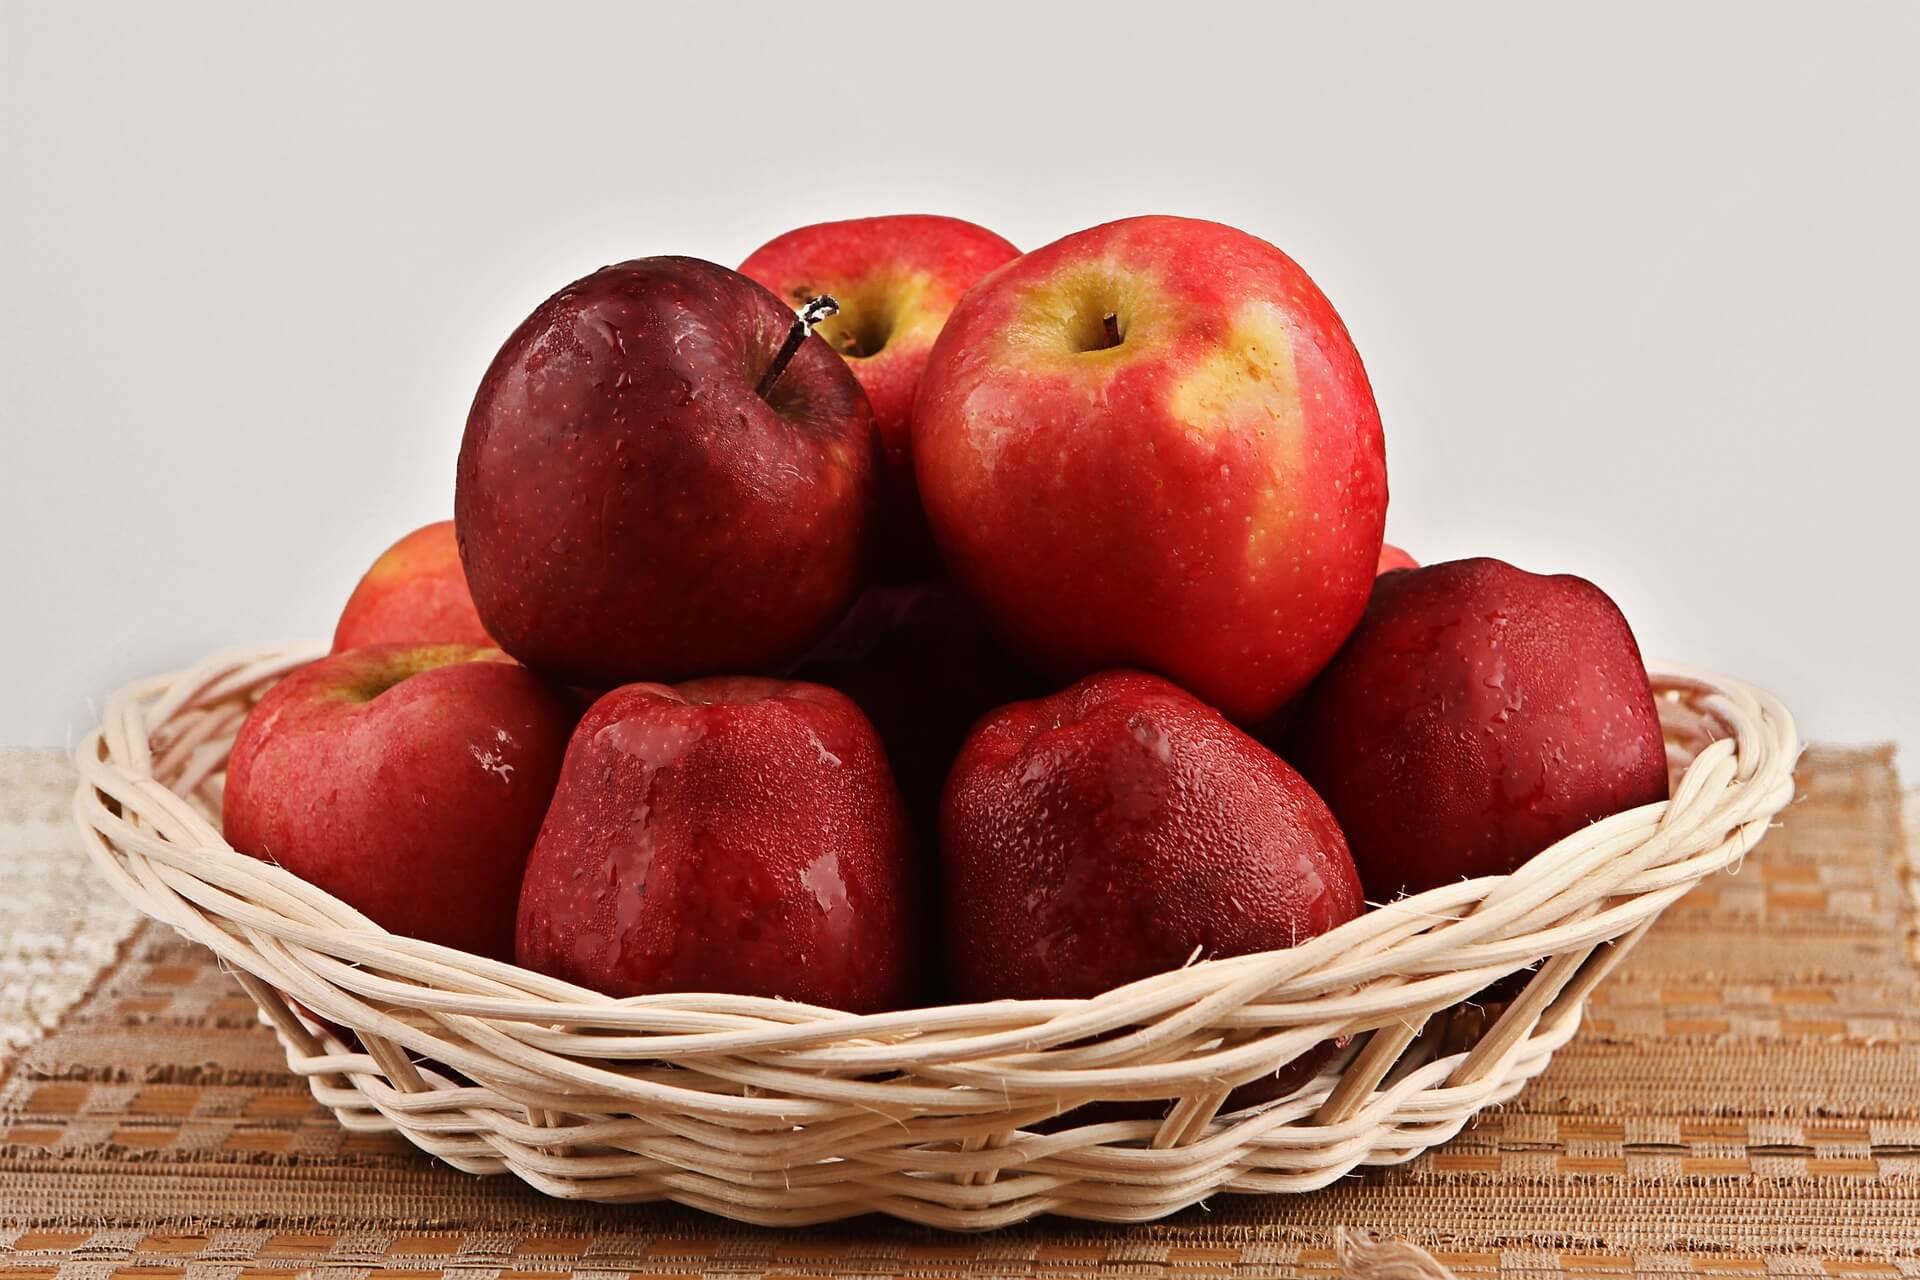 Manzanas rojas: alimentos para regular tu glucosa